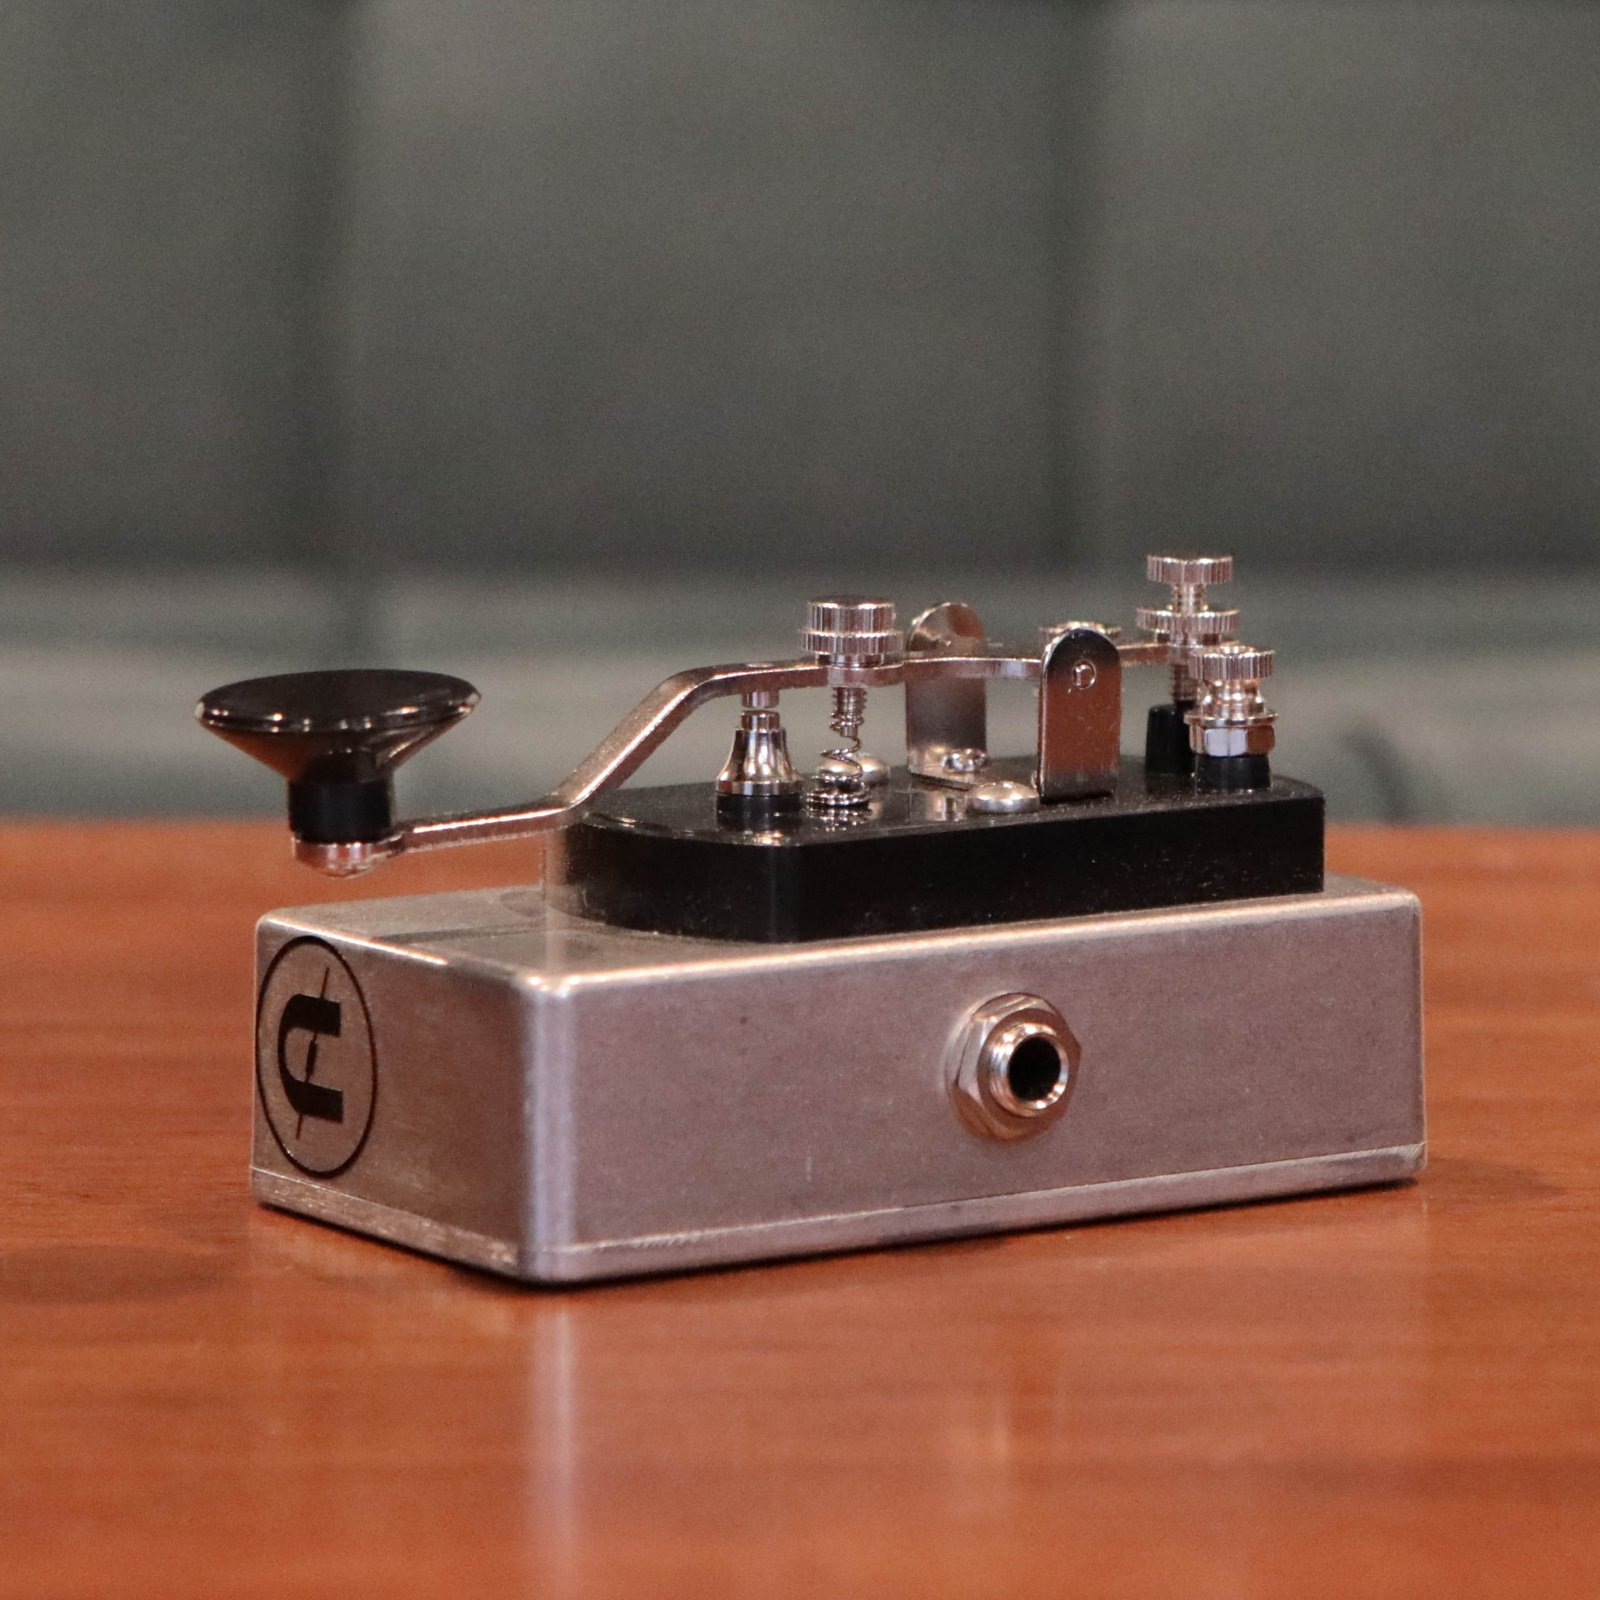 CopperSound Pedal Effects Telegraph Stutter Guitar Pedal - Standard Grey